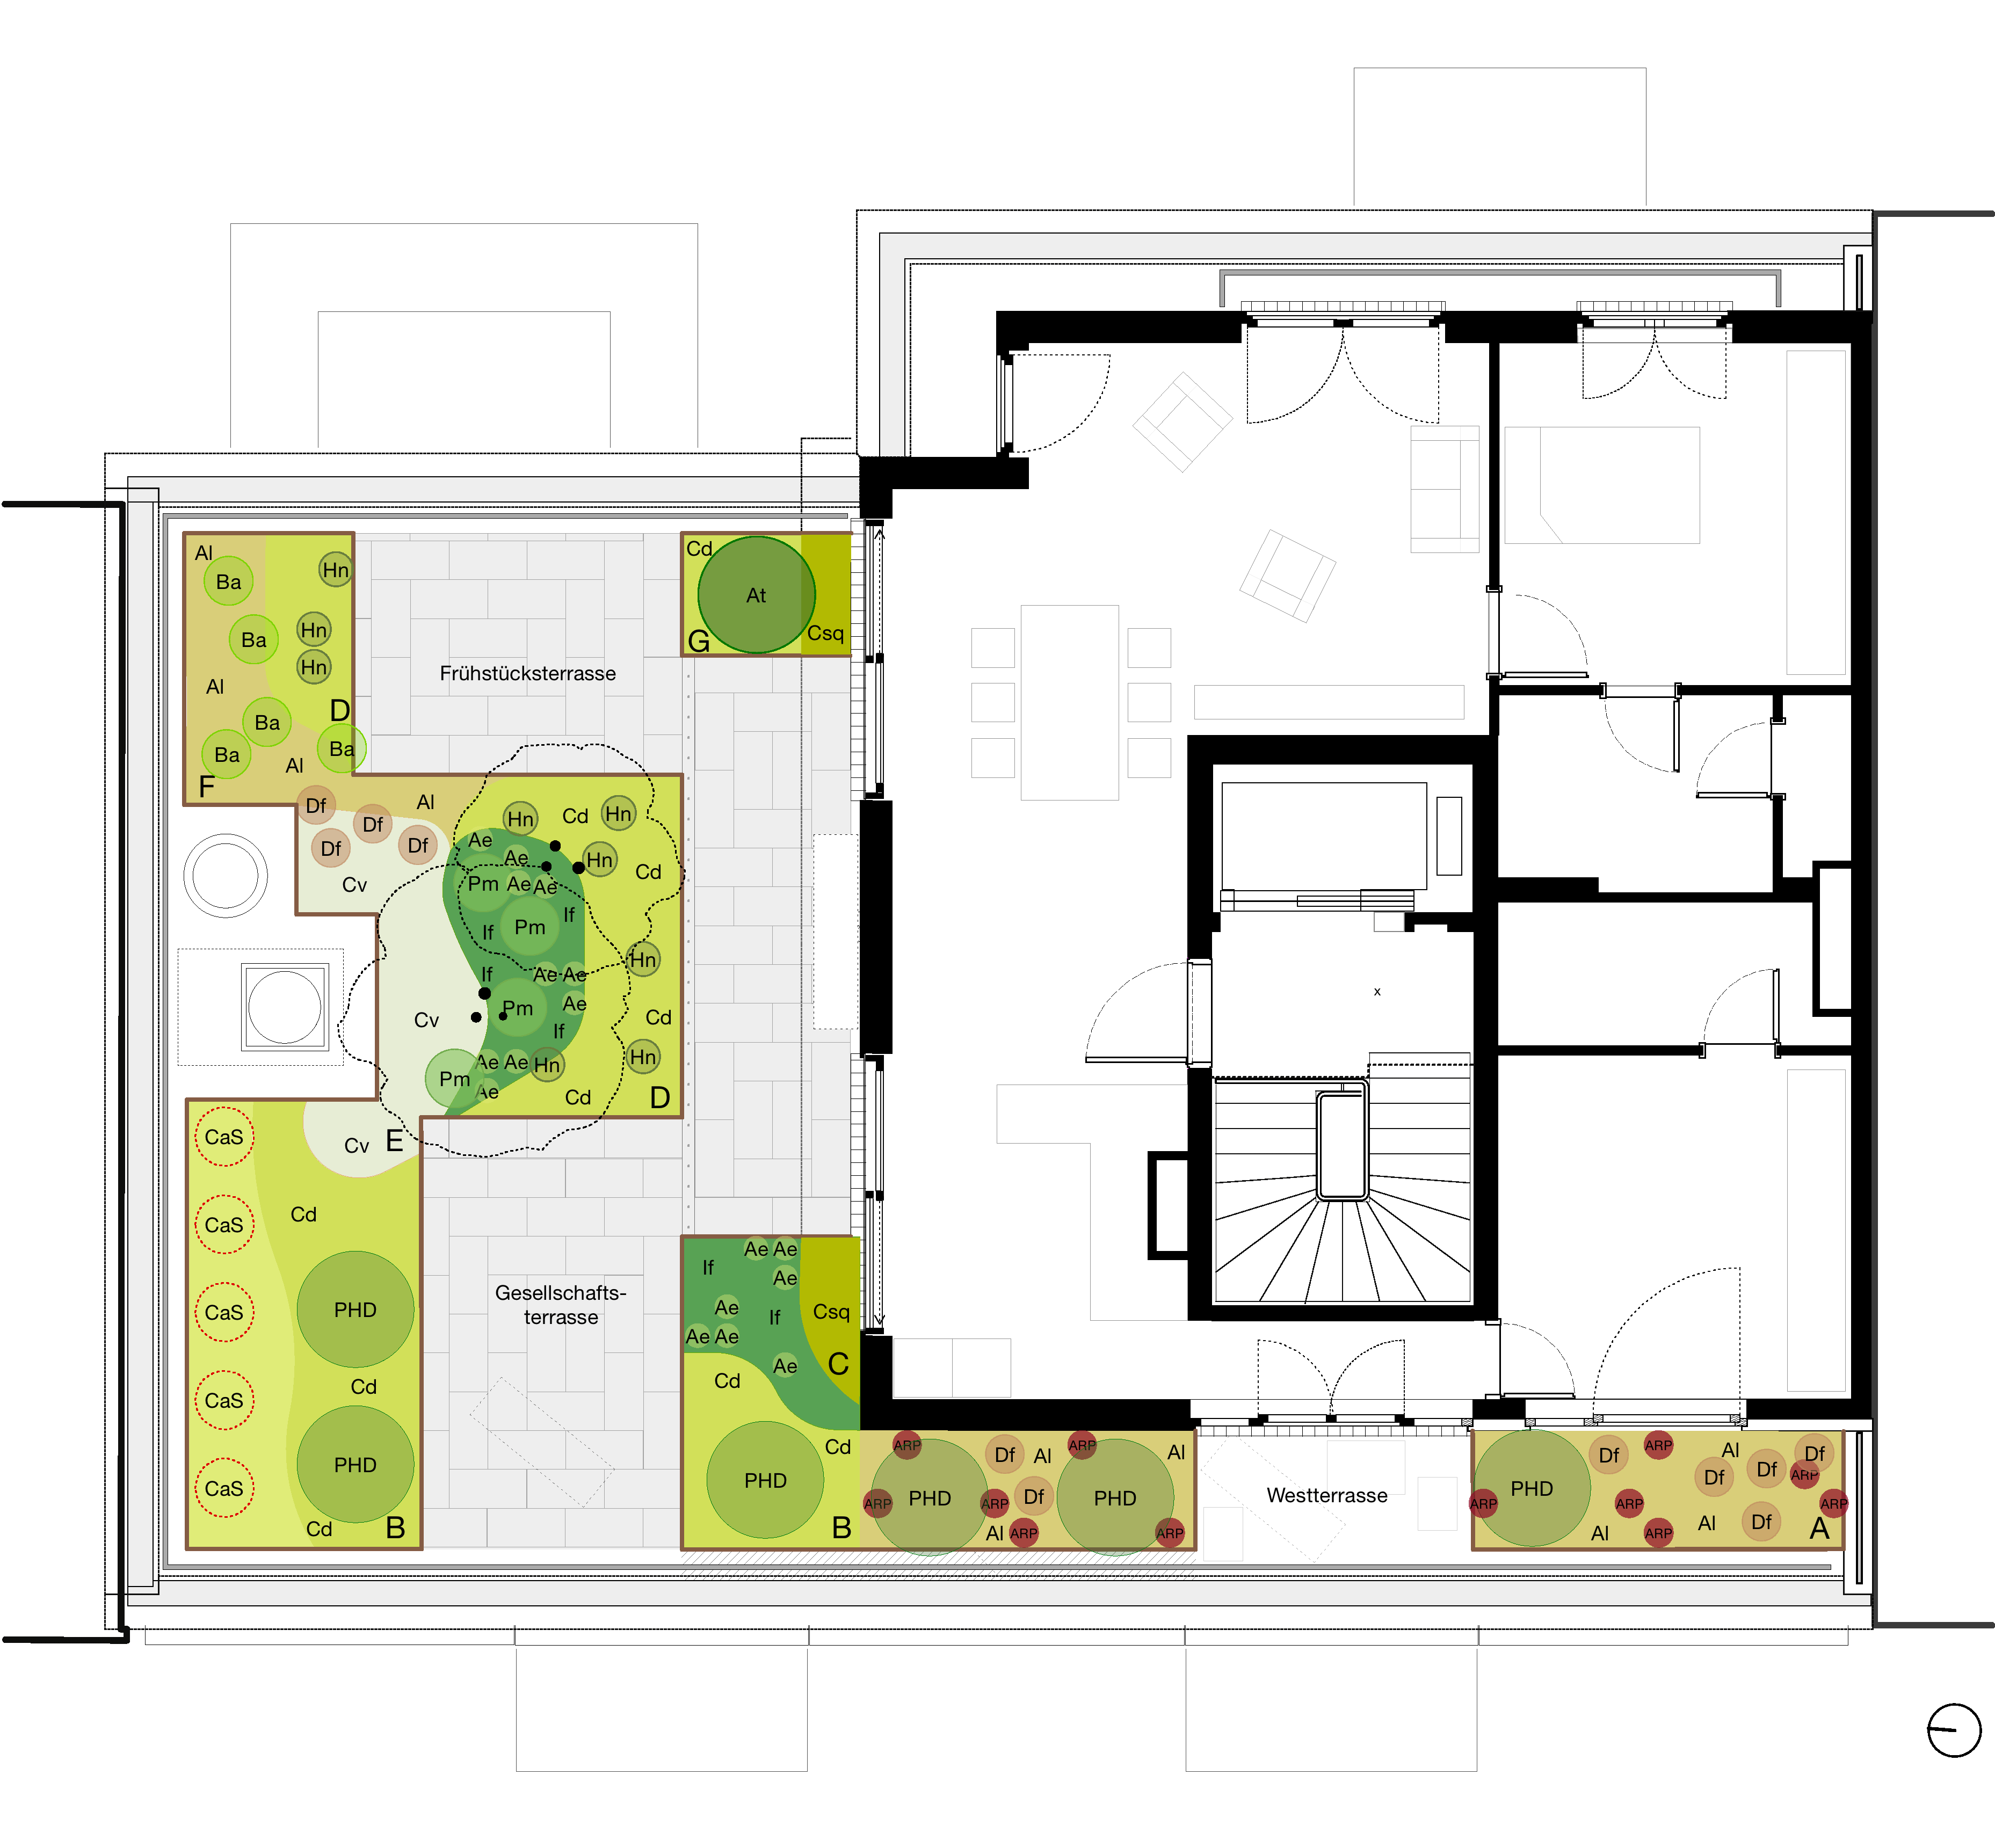 gierkezeile_dach_plan_01